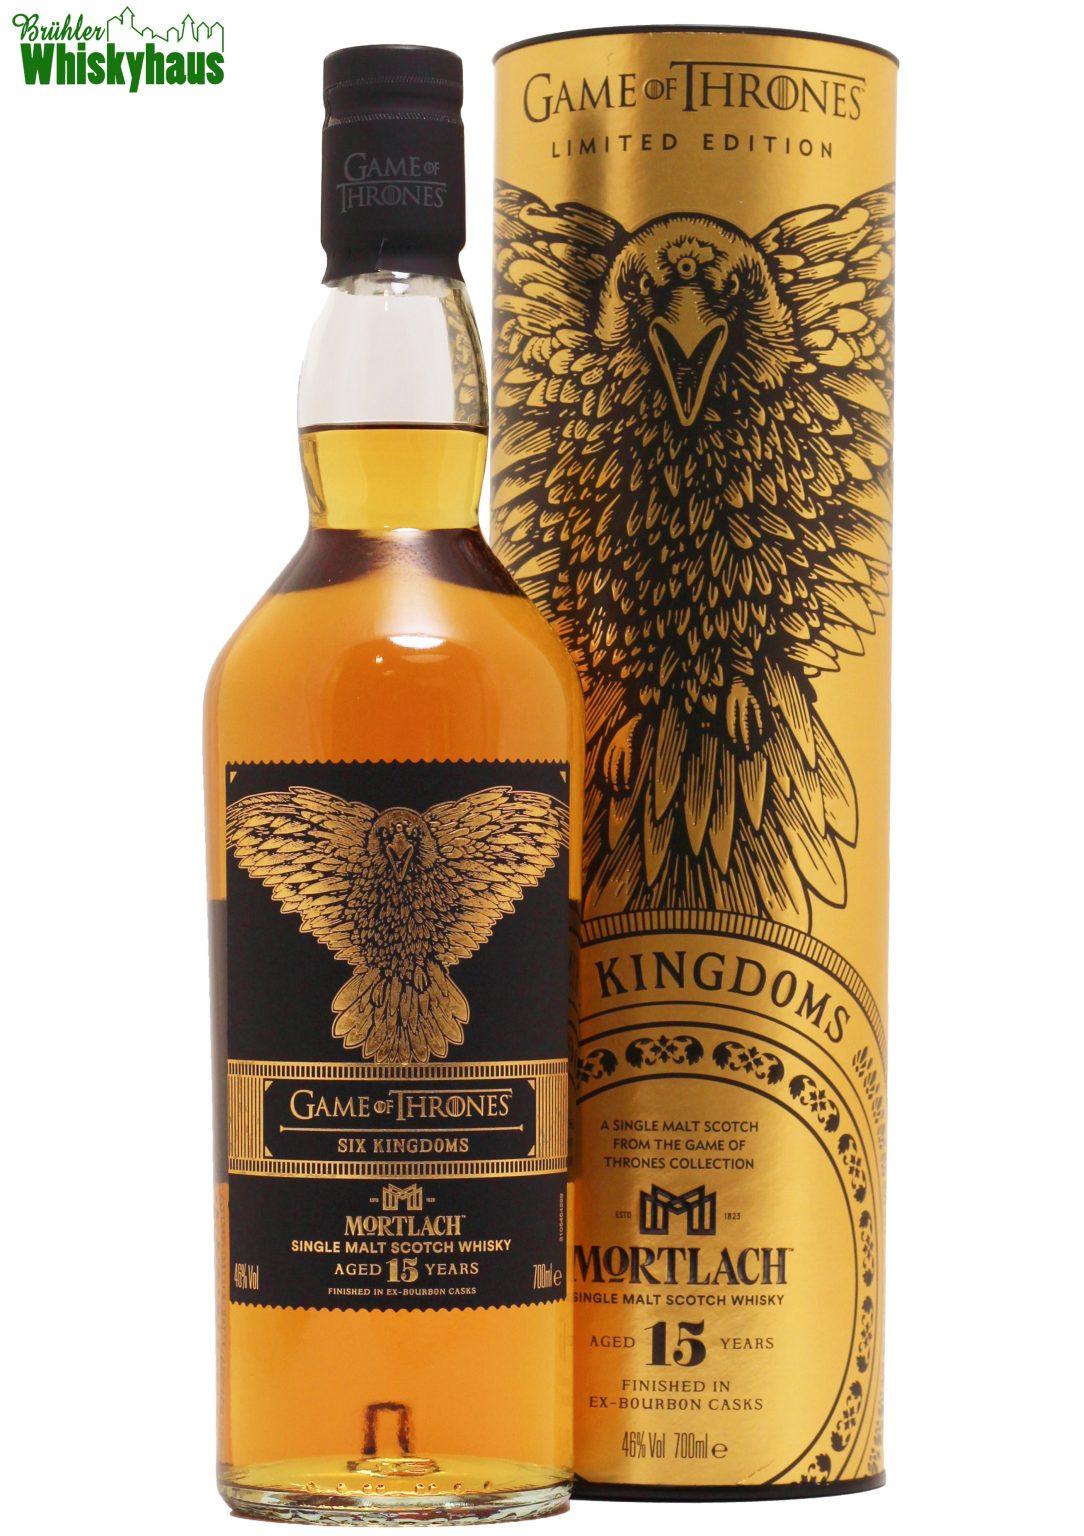 Mortlach 15 Jahre - Six Kingdoms Game of Thrones - Ex-Bourbon Cask Finish - Distillery Bottling - Single Malt Scotch Whisky